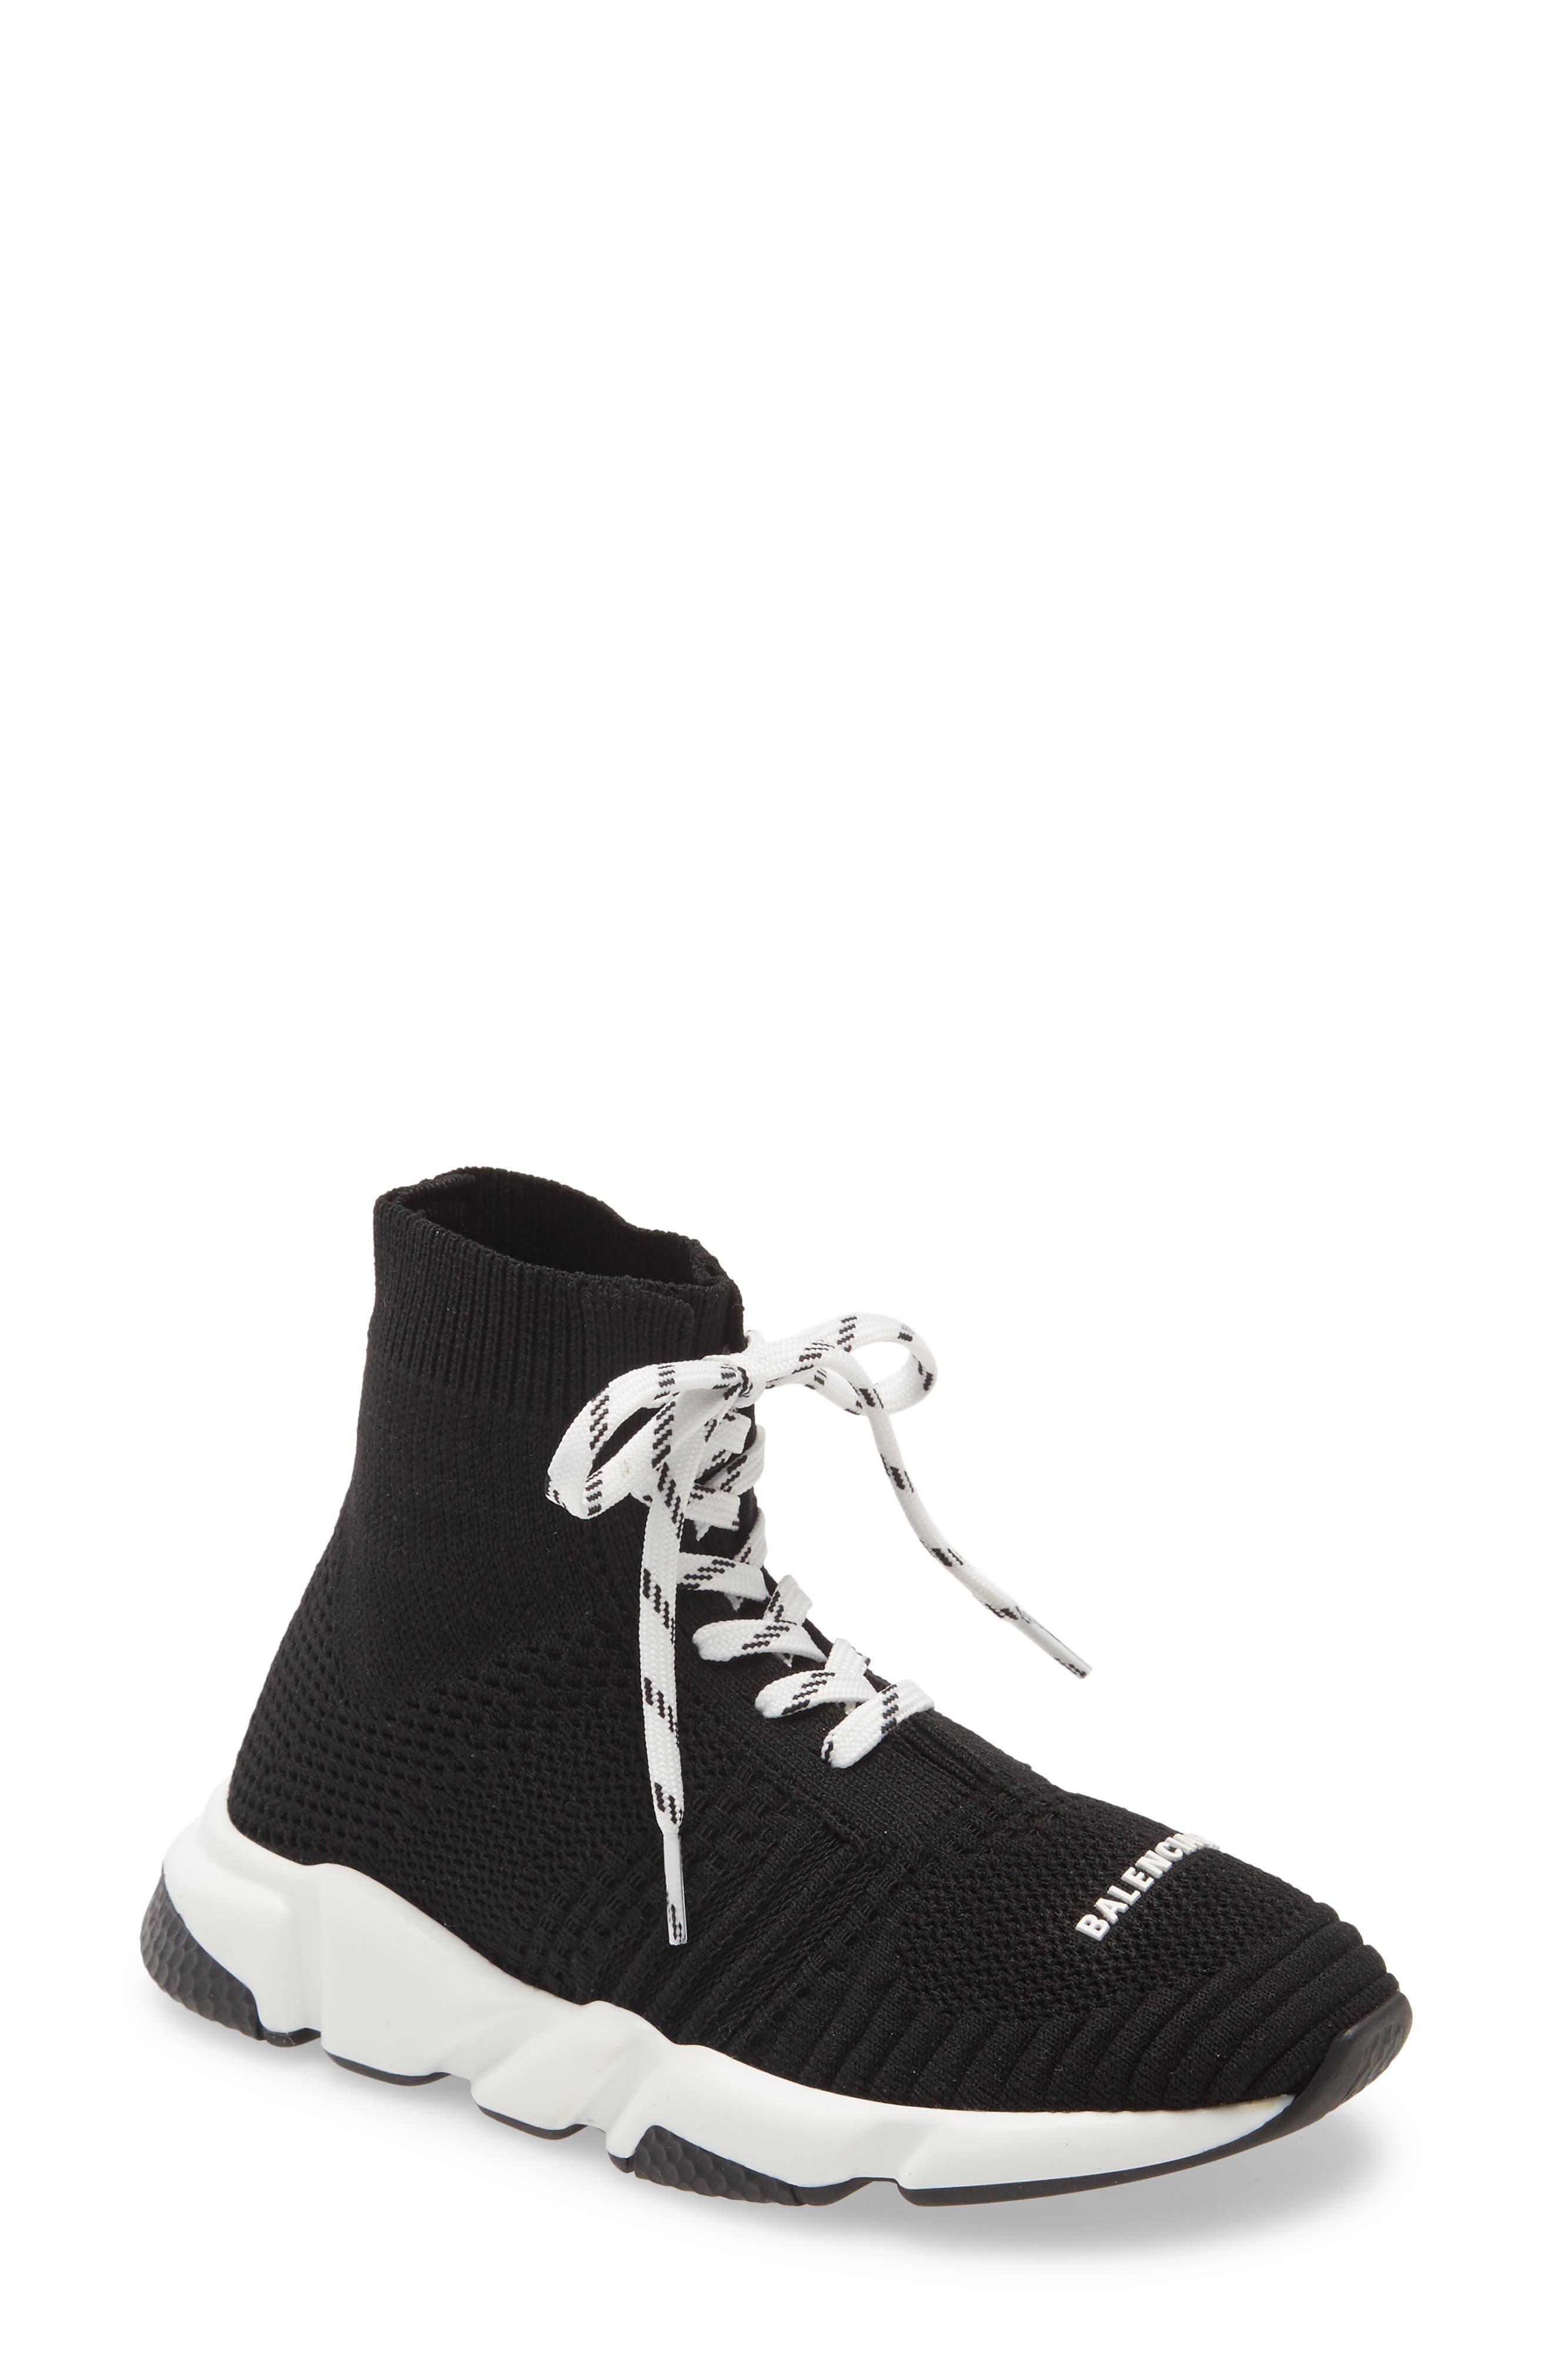 Girls' Balenciaga Shoes (Sizes 12.5